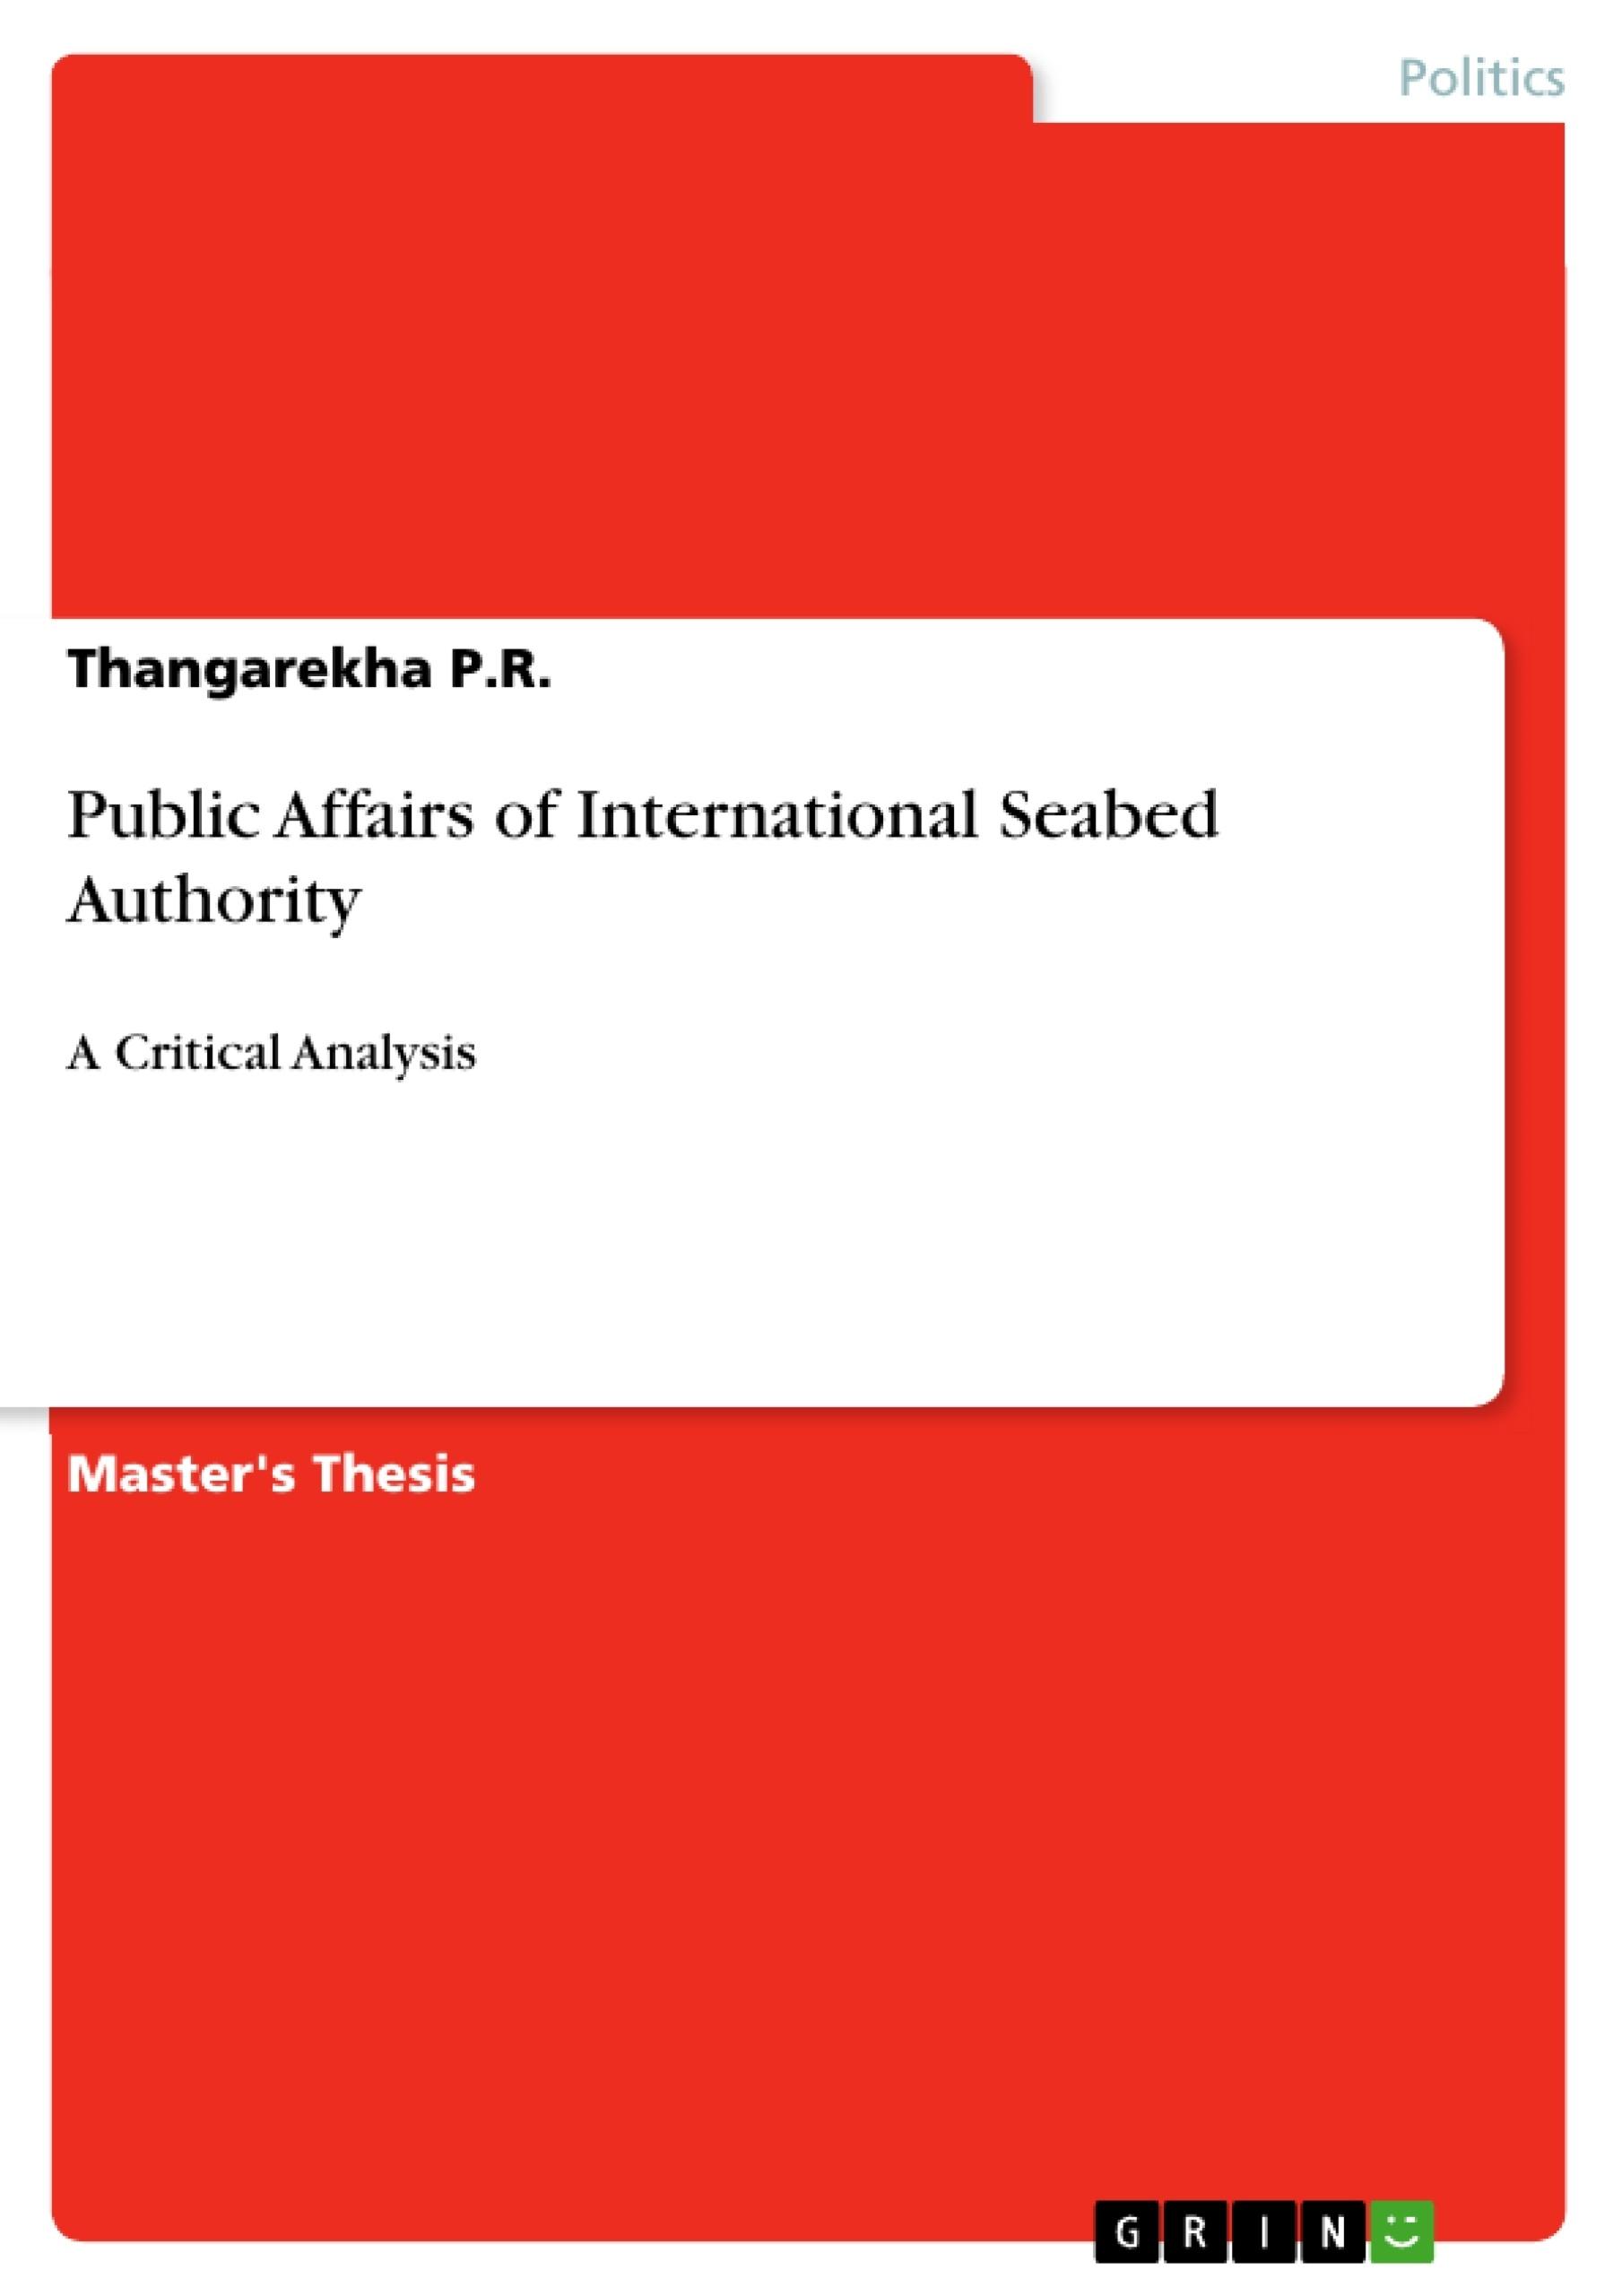 Title: Public Affairs of International Seabed Authority